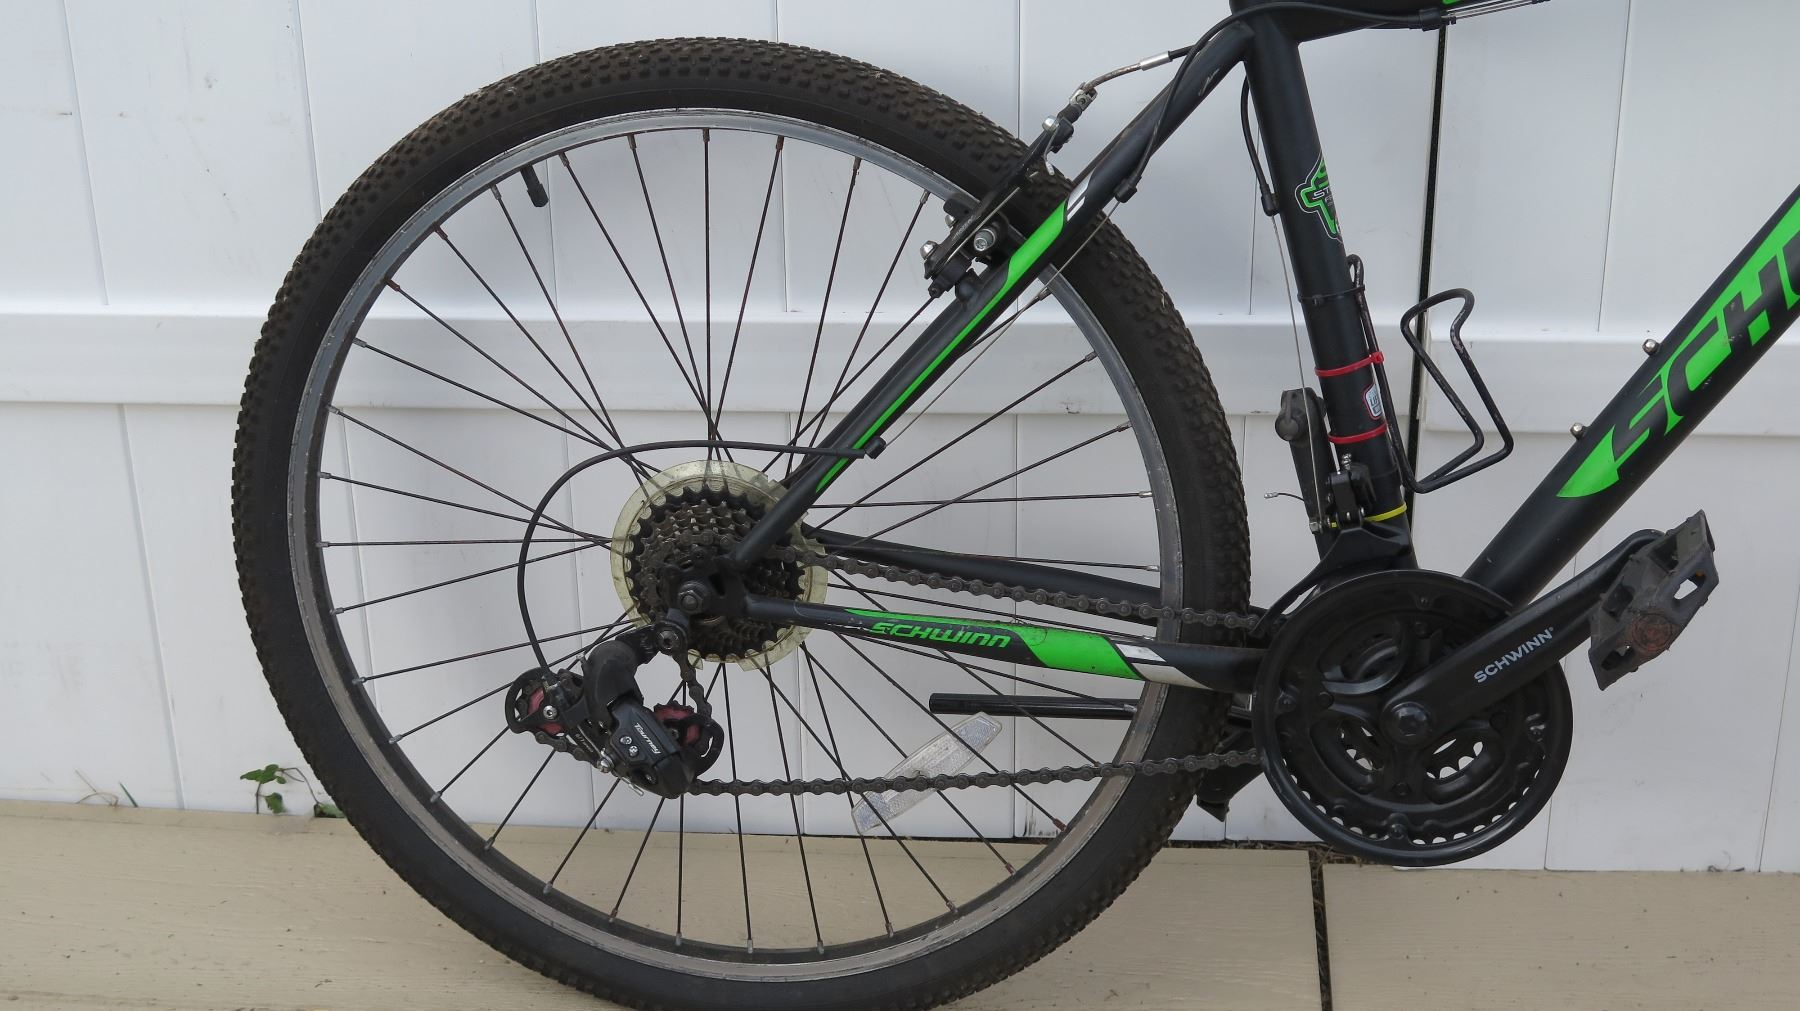 e55fd4a5fe2 ... Image 3 : Schwinn Sidewinder 2G Men's Shimano Equipped Black Green Mountain  Bike ...